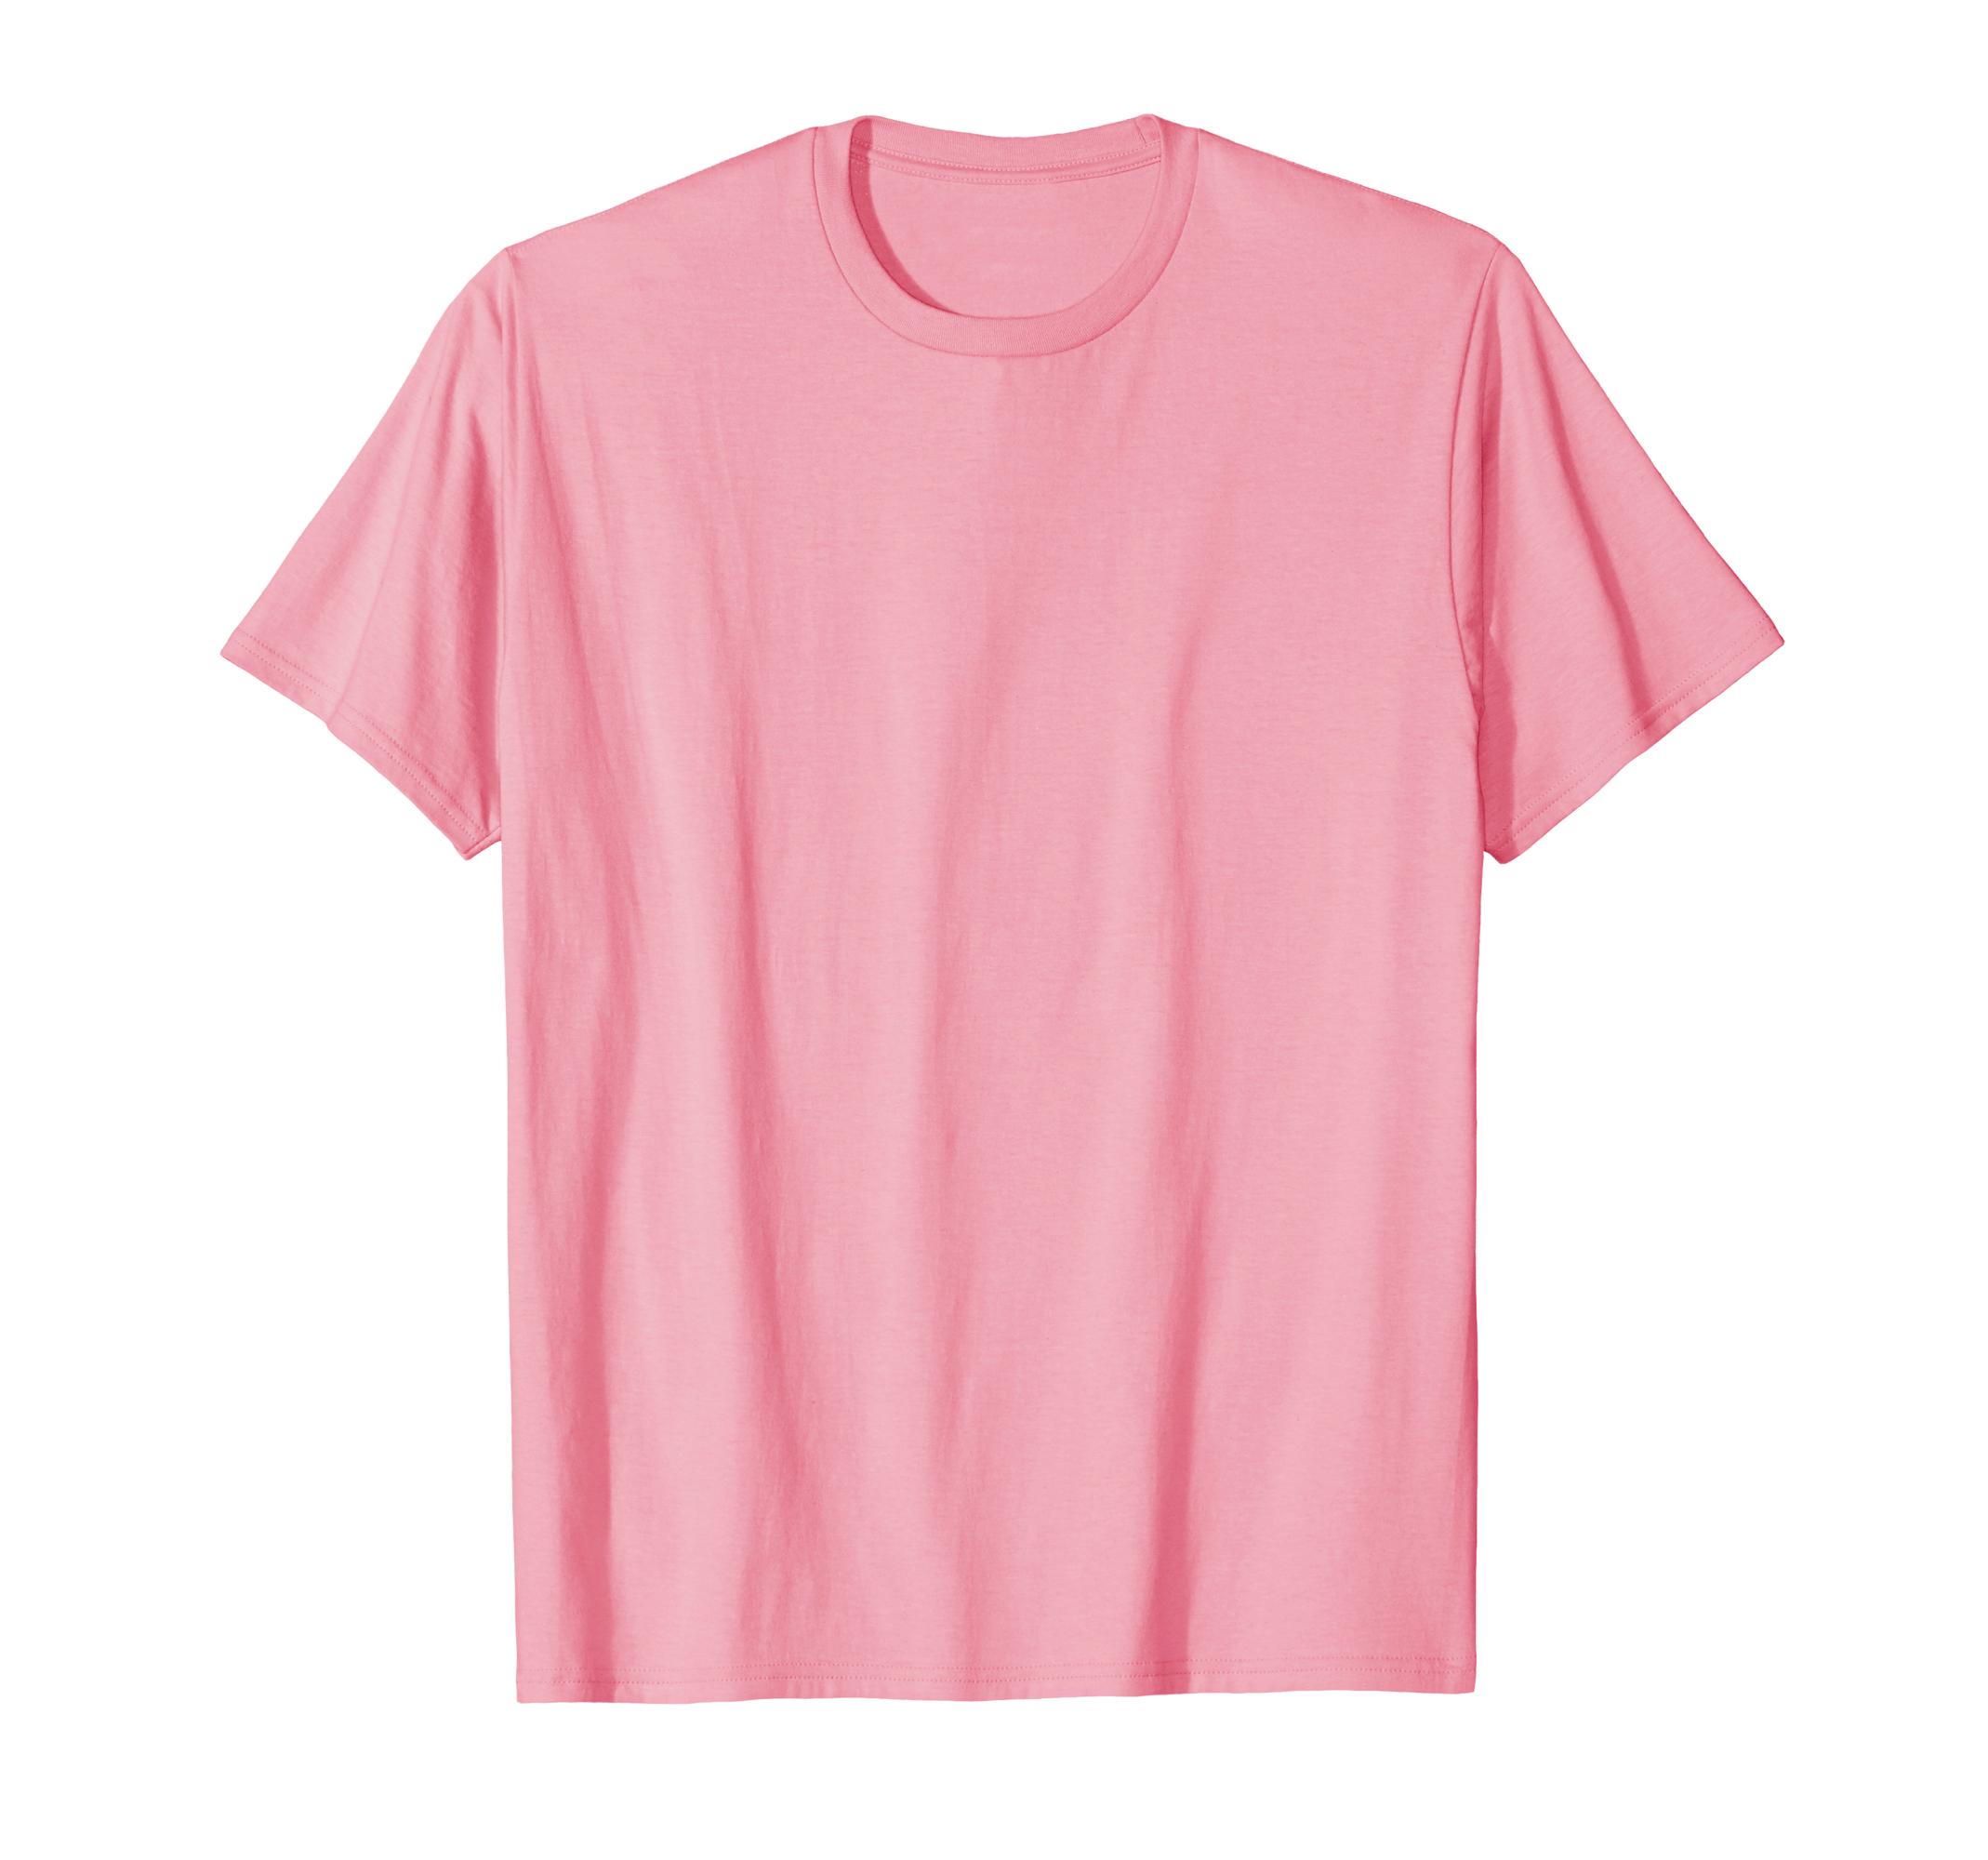 Stubborn Guinea Fowl Tricks T Shirt Sweatshirts Tee Shirt